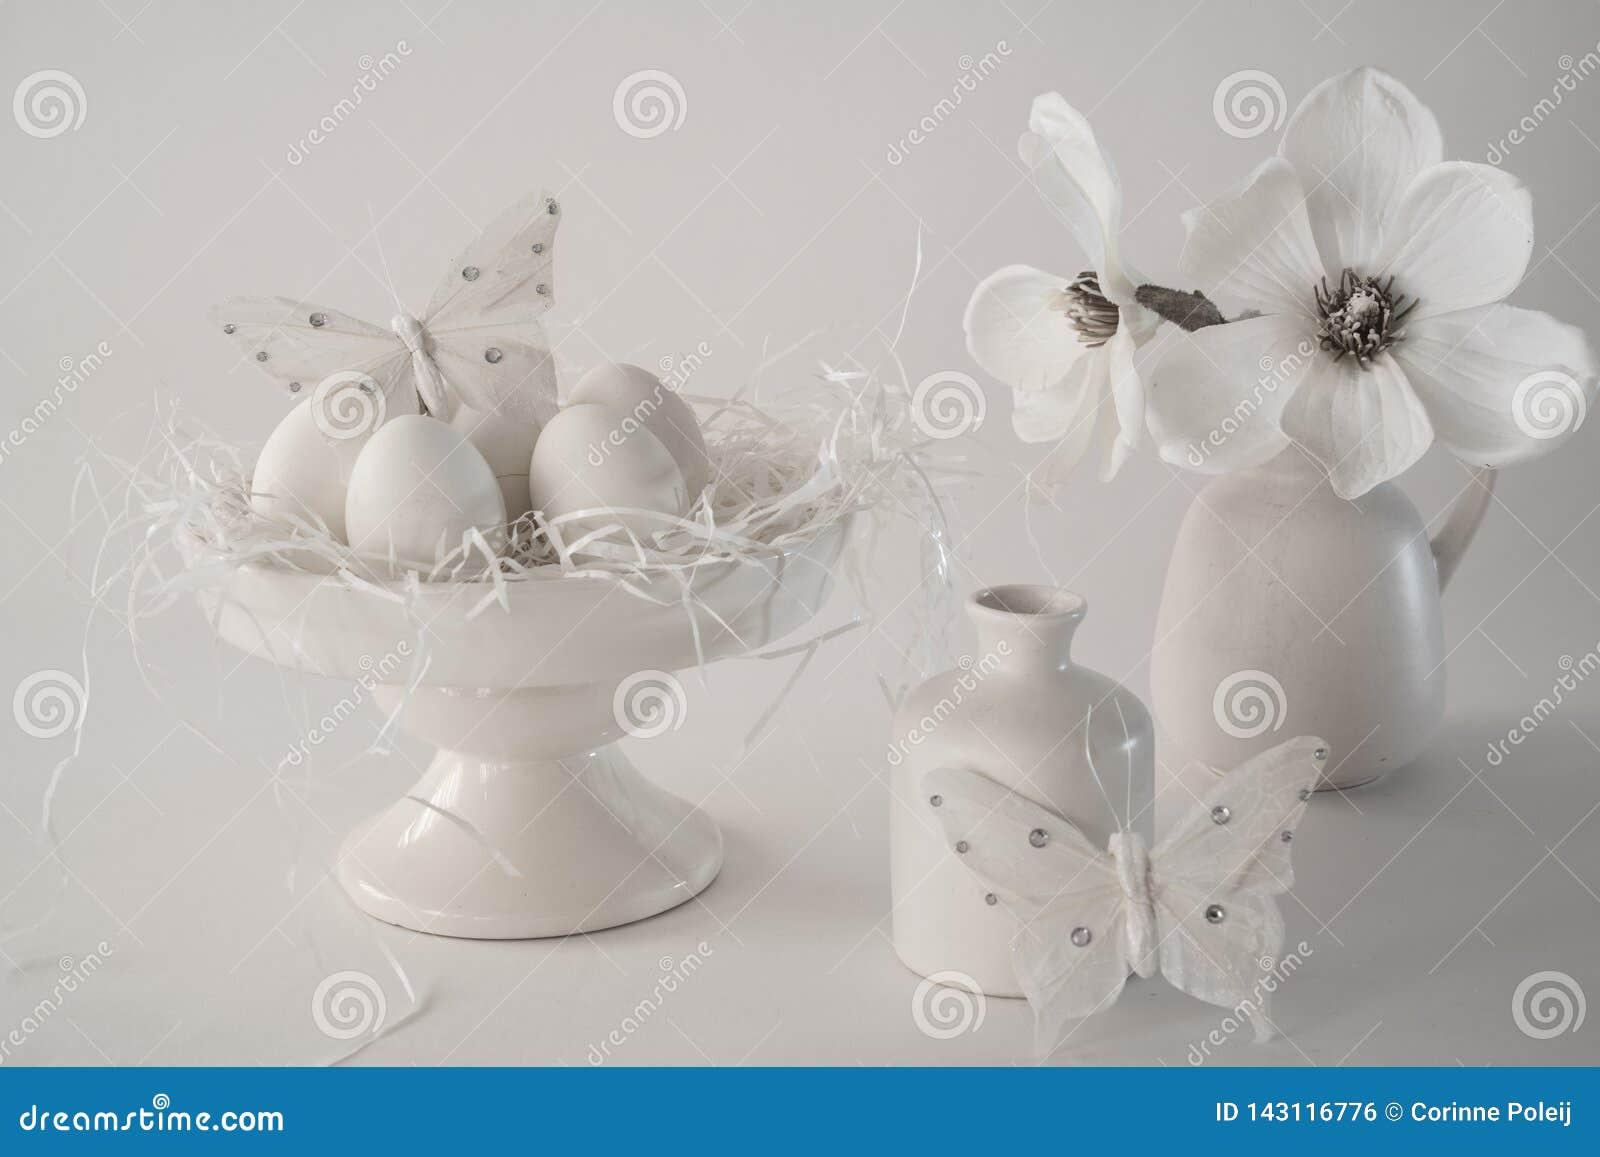 White vintage Easter scene, cake stand with eggs, vases, flowers, against white background